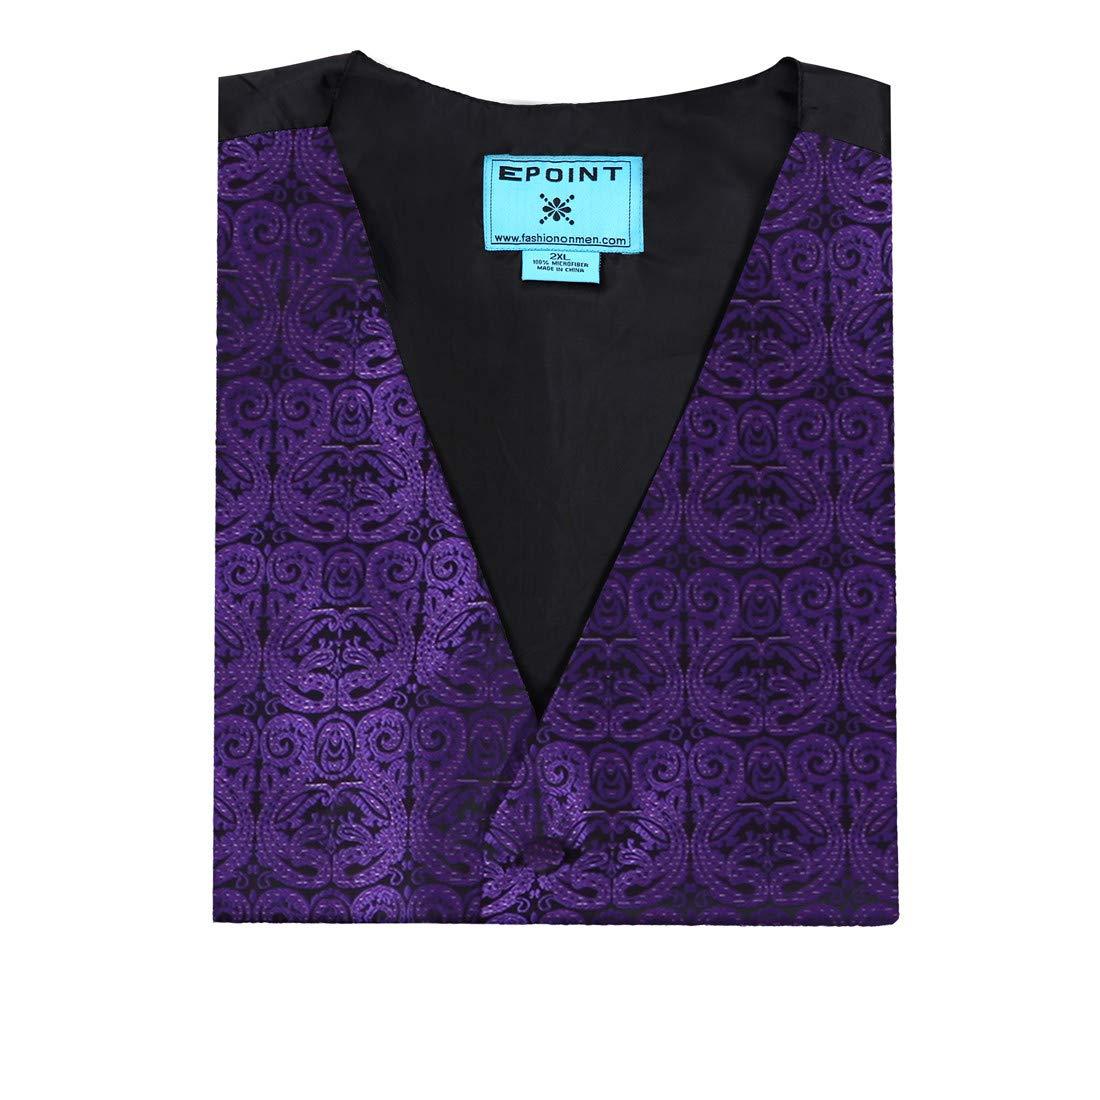 Epoint EGC1B01-03 Multi Mens Paisley Waistcoat Woven Microfiber S-5XL Vest